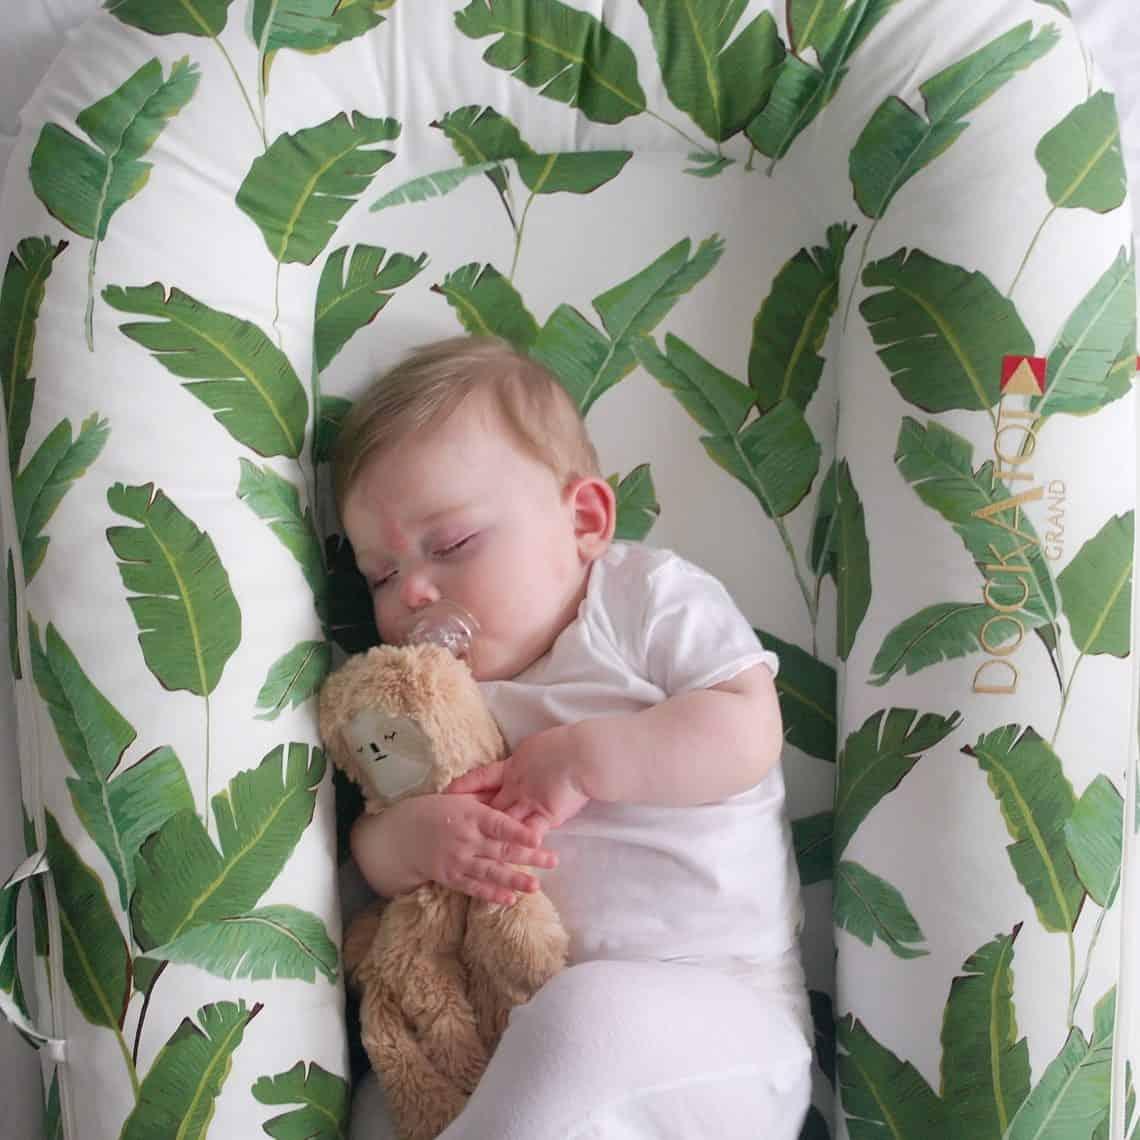 Sleeping baby in DockATot Grand